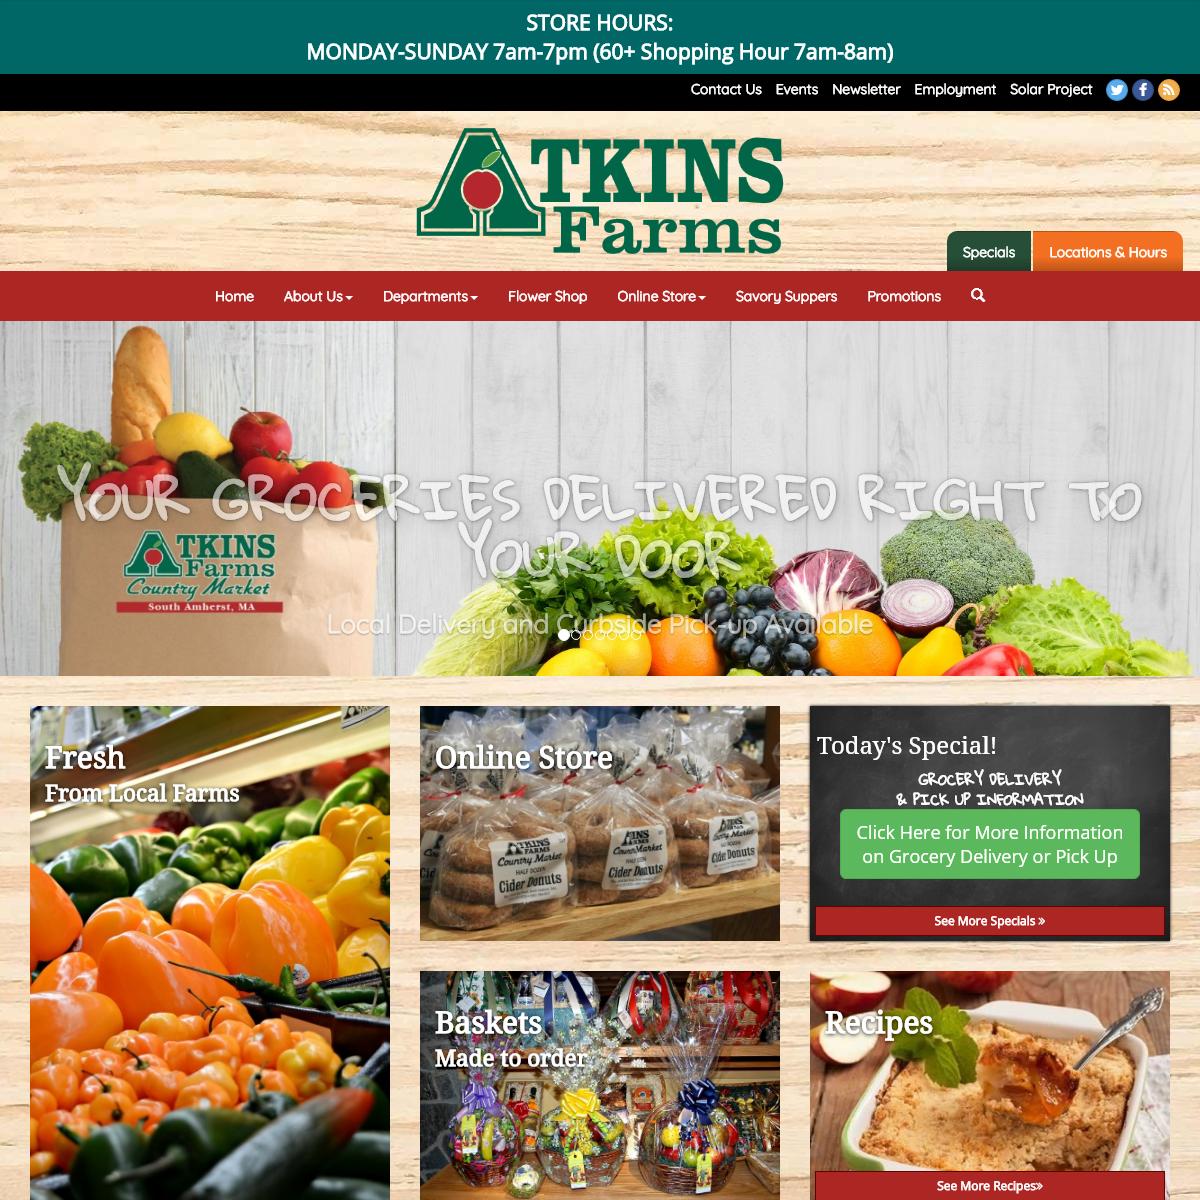 Atkins Farm Country Market - Amherst MA